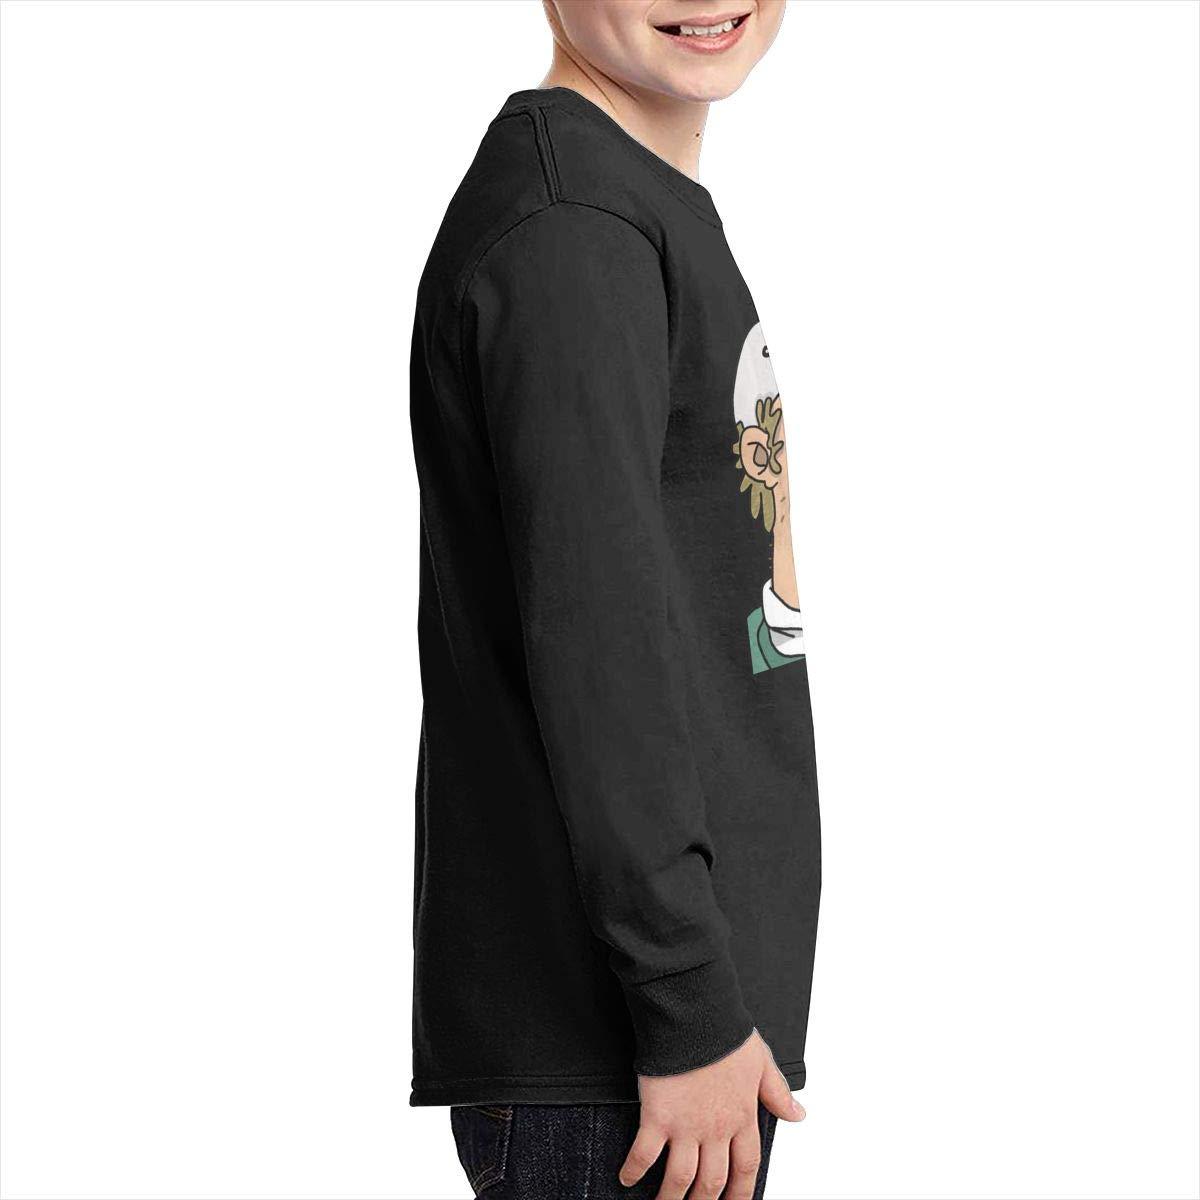 RhteGui Mac Demarco Boys /& Girls Junior Vintage Long Sleeve T-Shirt Black